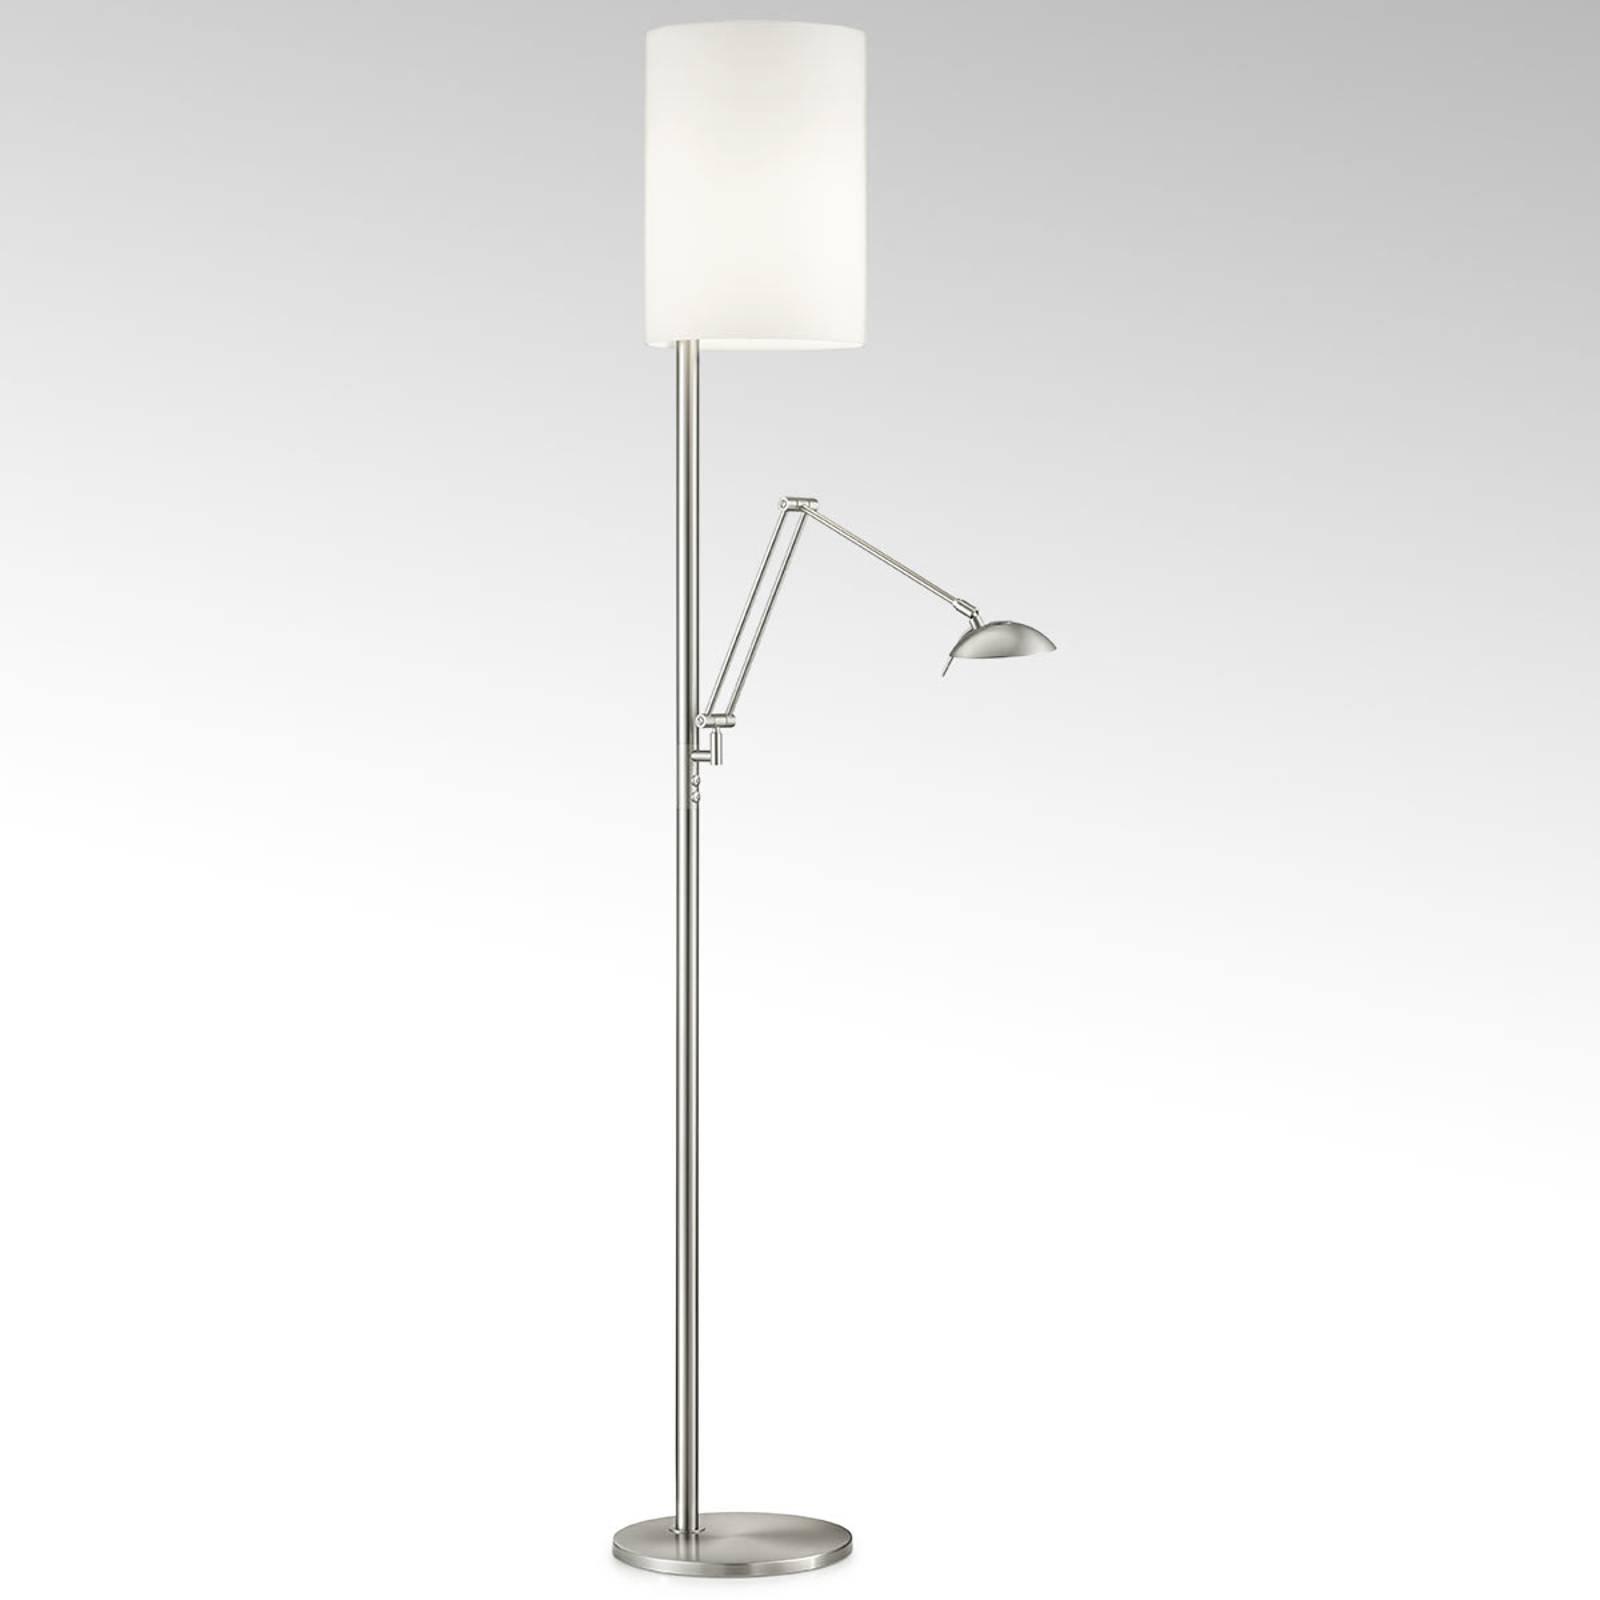 LED-gulvlampe Nola, matt nikkel